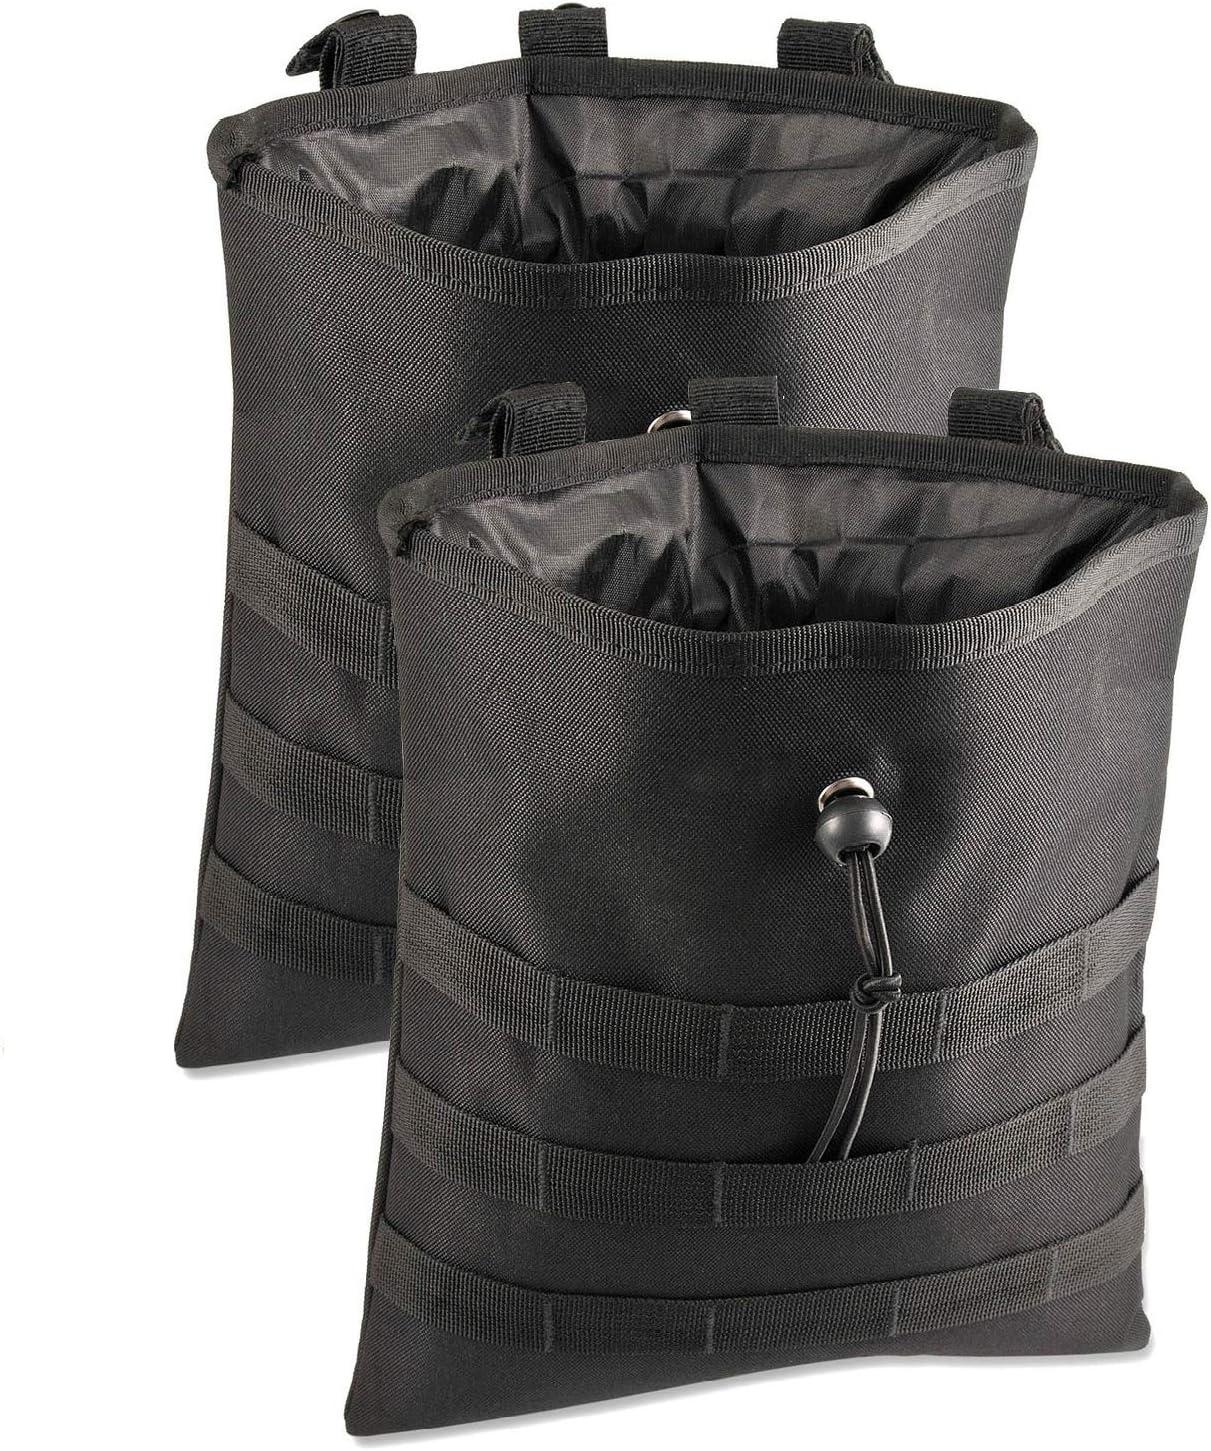 ATBP National uniform free shipping 6 Mags Dump Pouch Soldering Ammo Tool Shell Belt Shotgun Holder